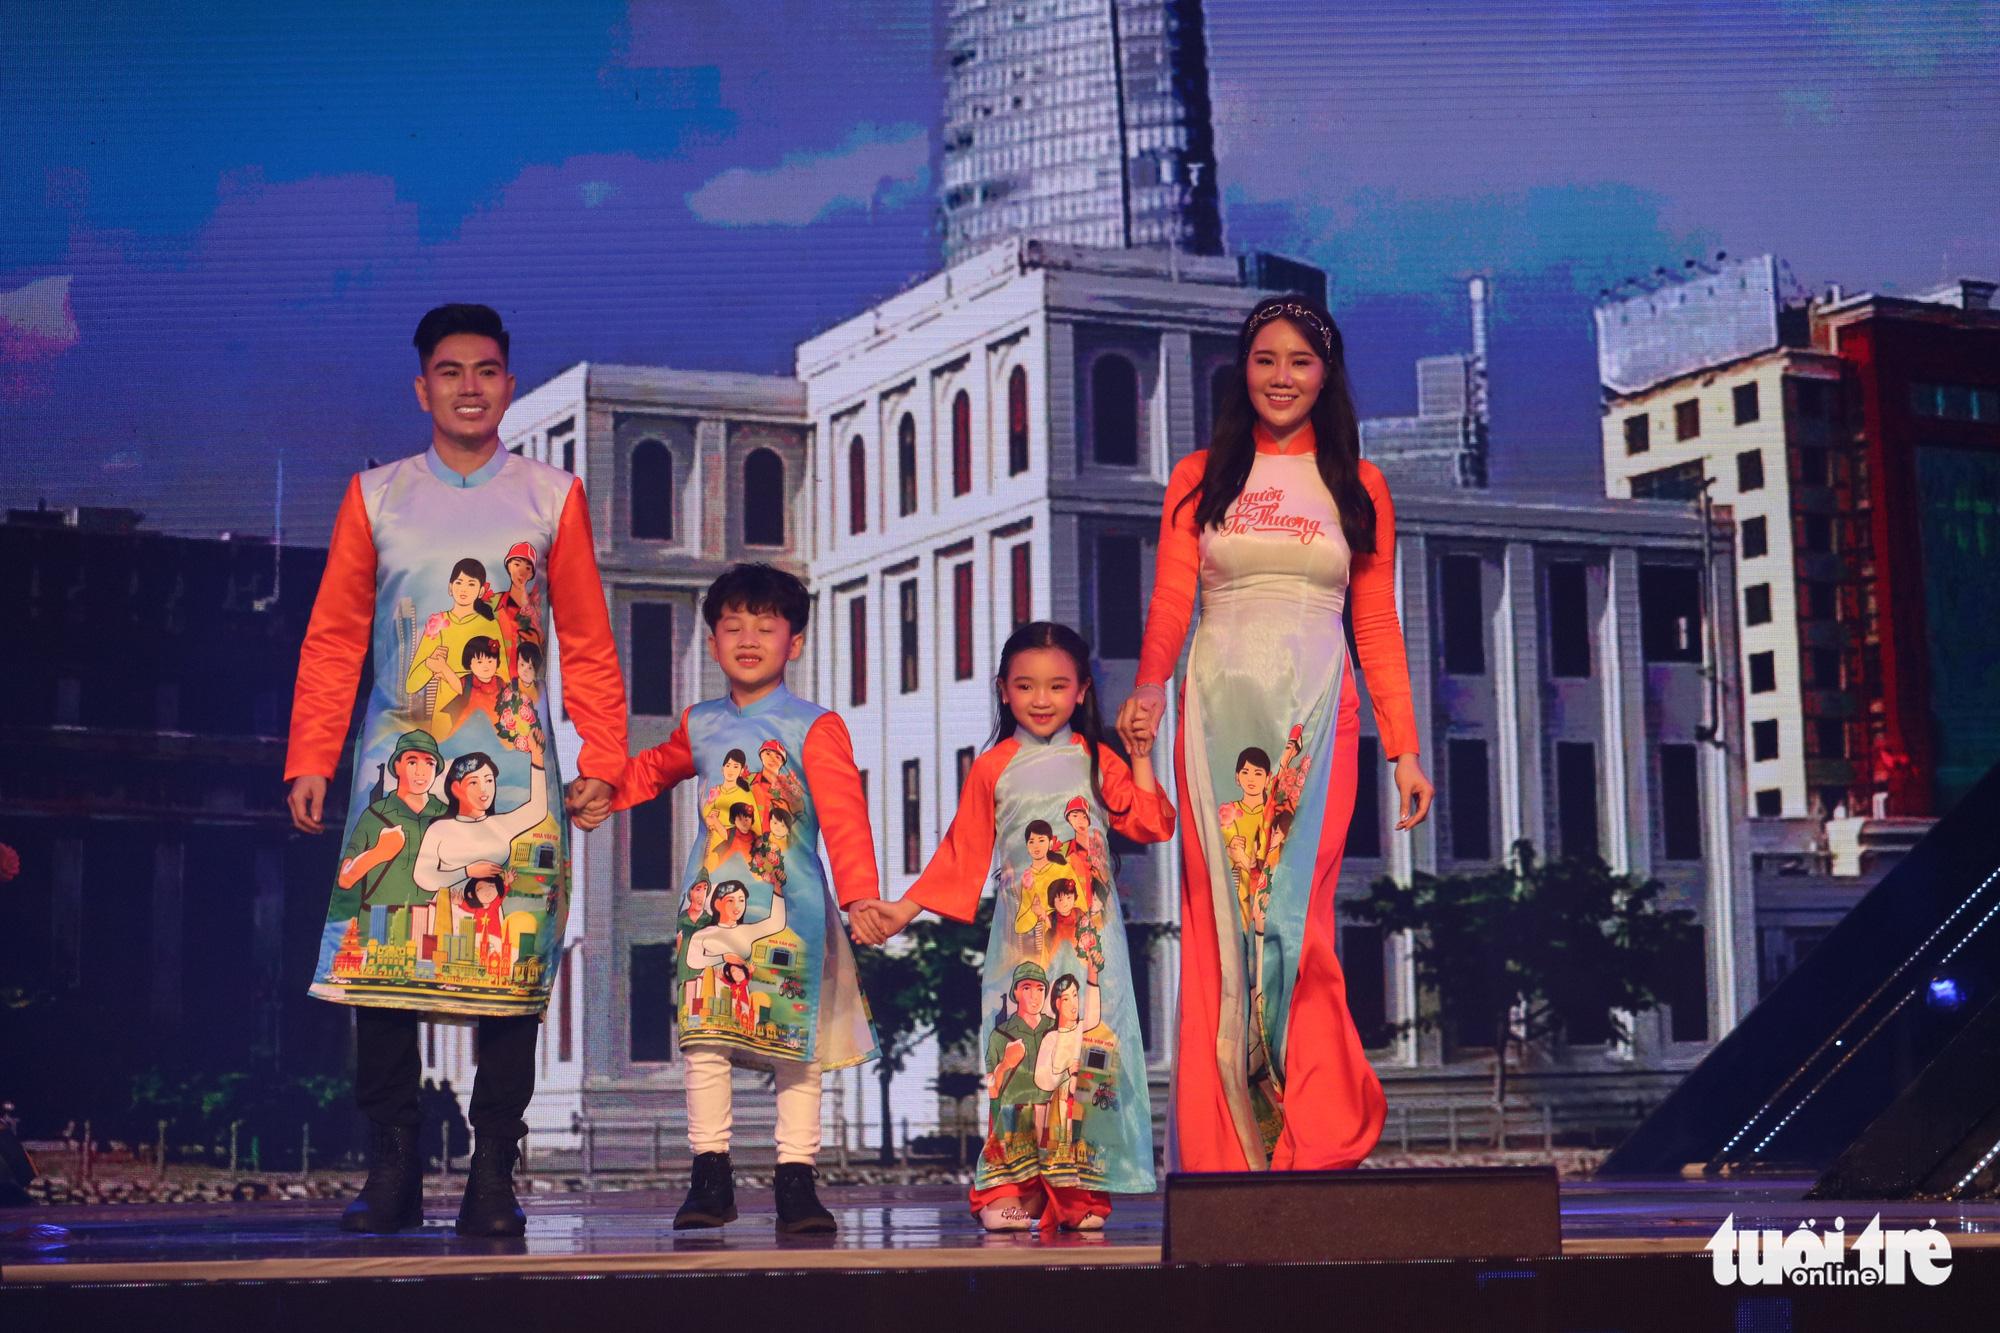 Ho Chi Minh City Ao Dai Festival kicks off at Nguyen Hue Pedestrian Street